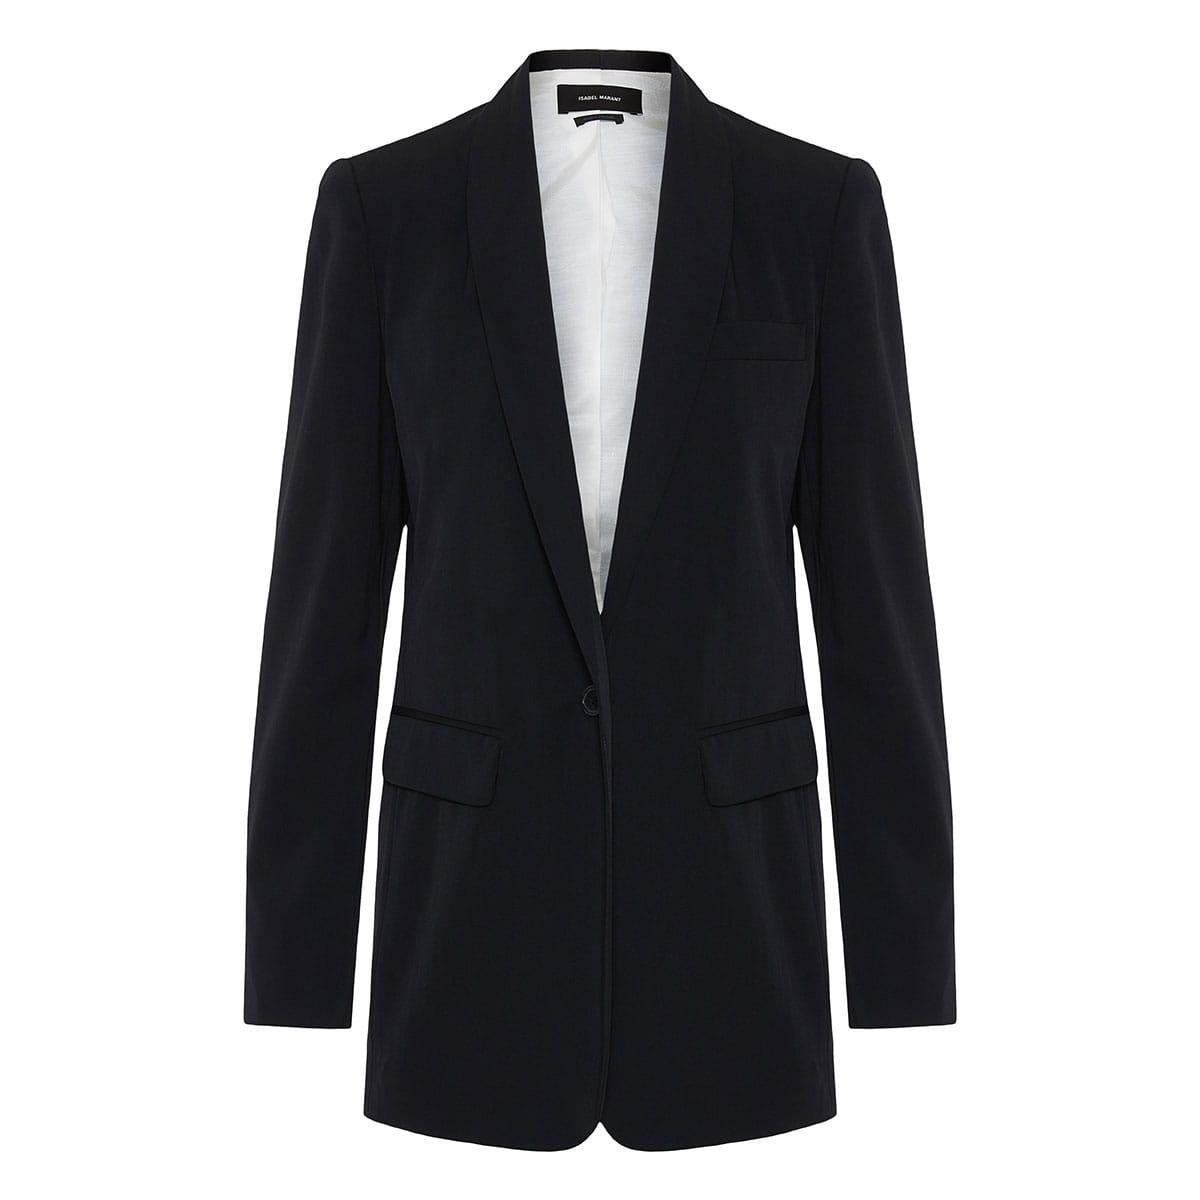 Oversized single-breasted blazer